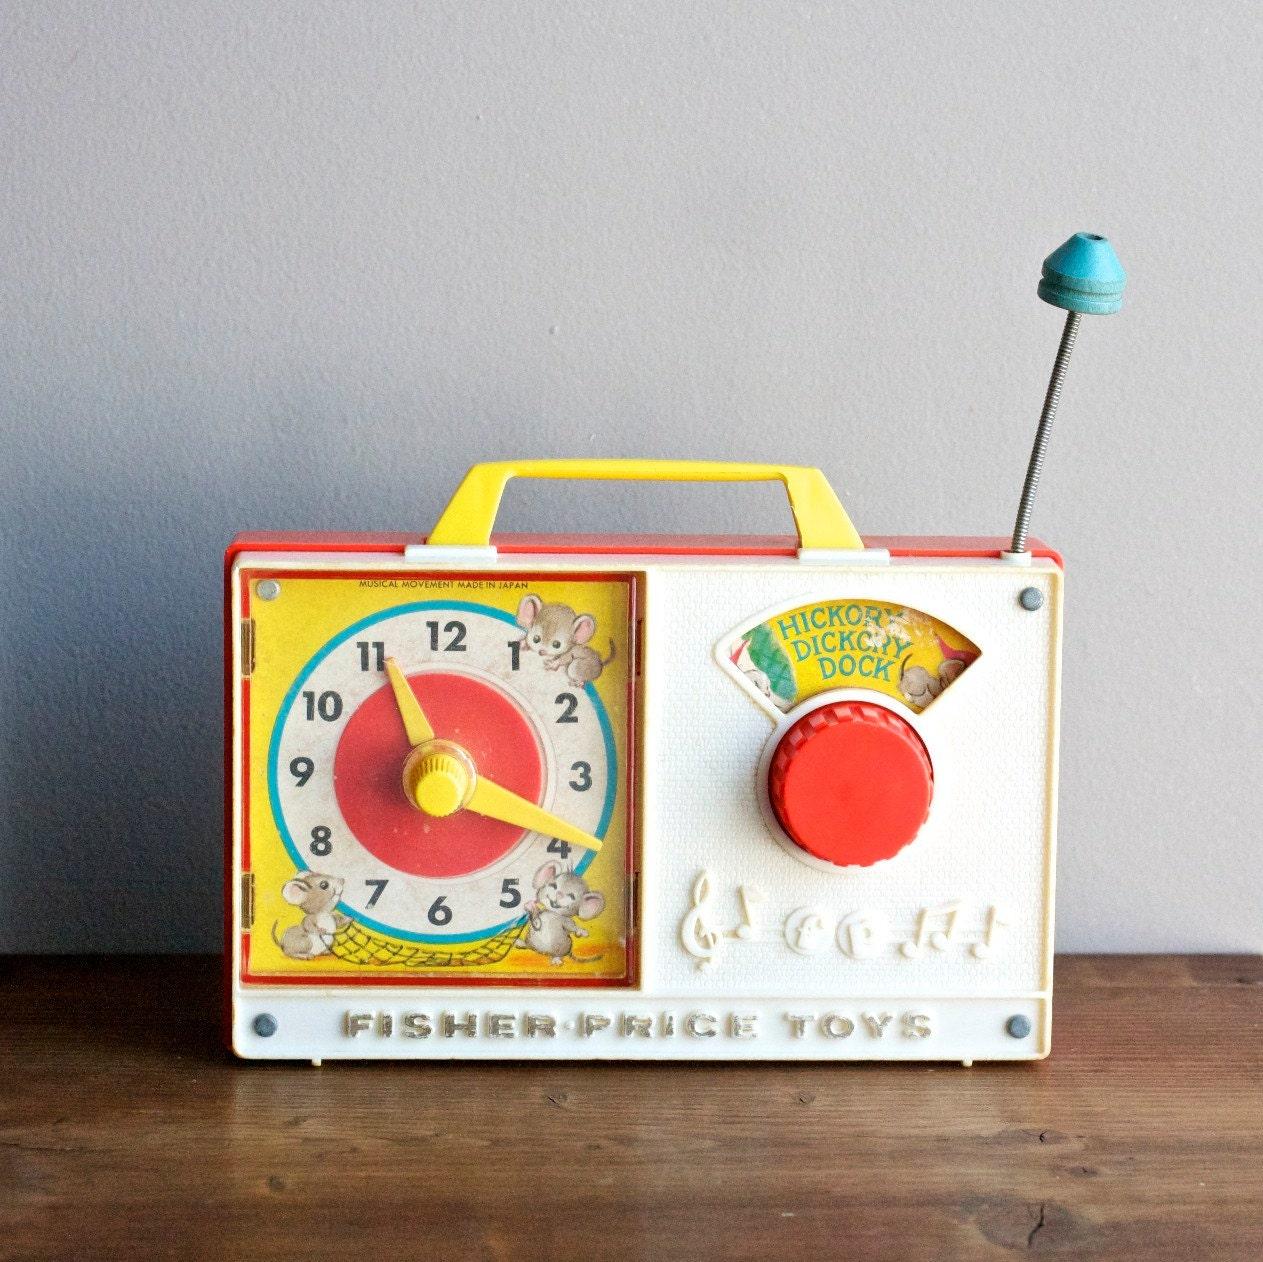 Fisher Price Toys Radio // Children's Toy Radio // Hickory